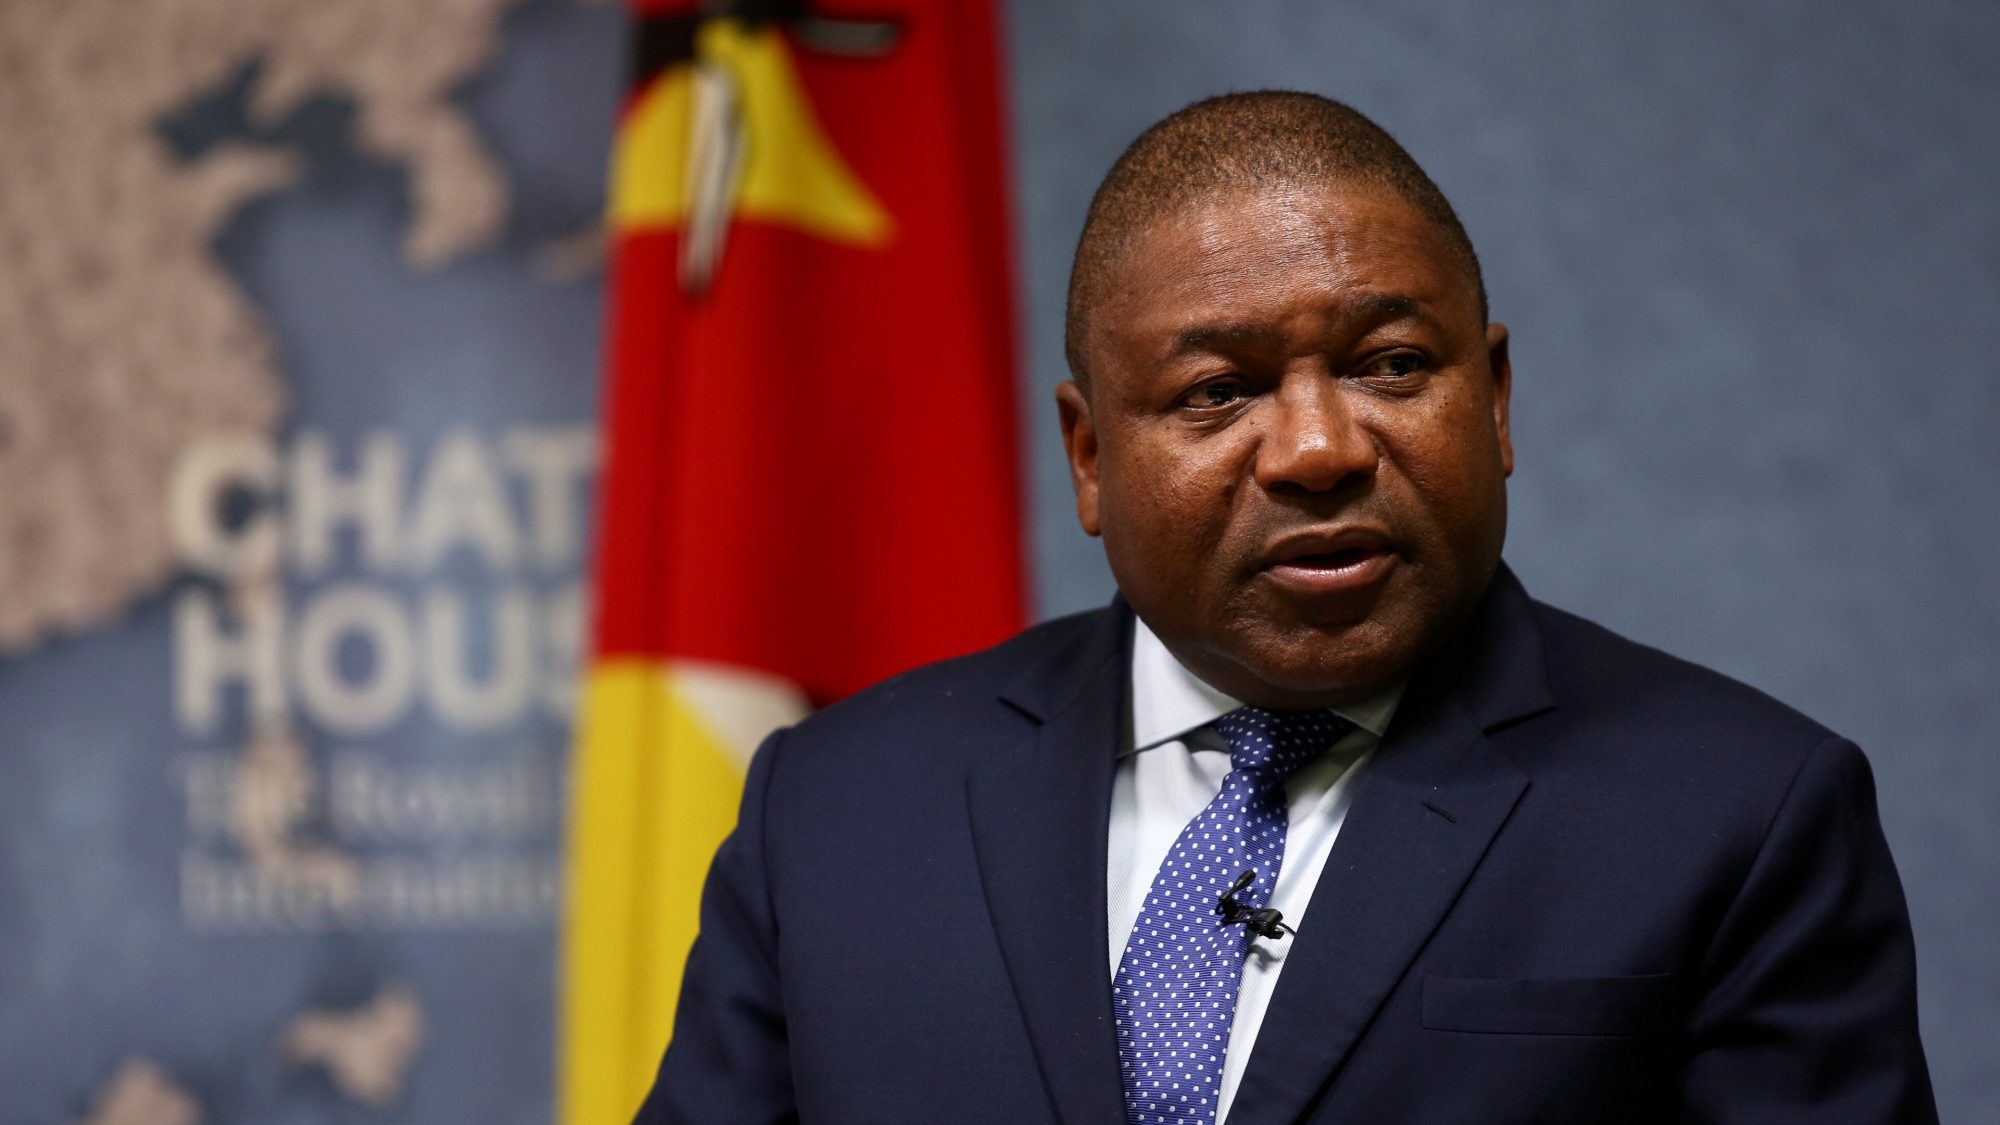 Current Mozambique President Nyusi